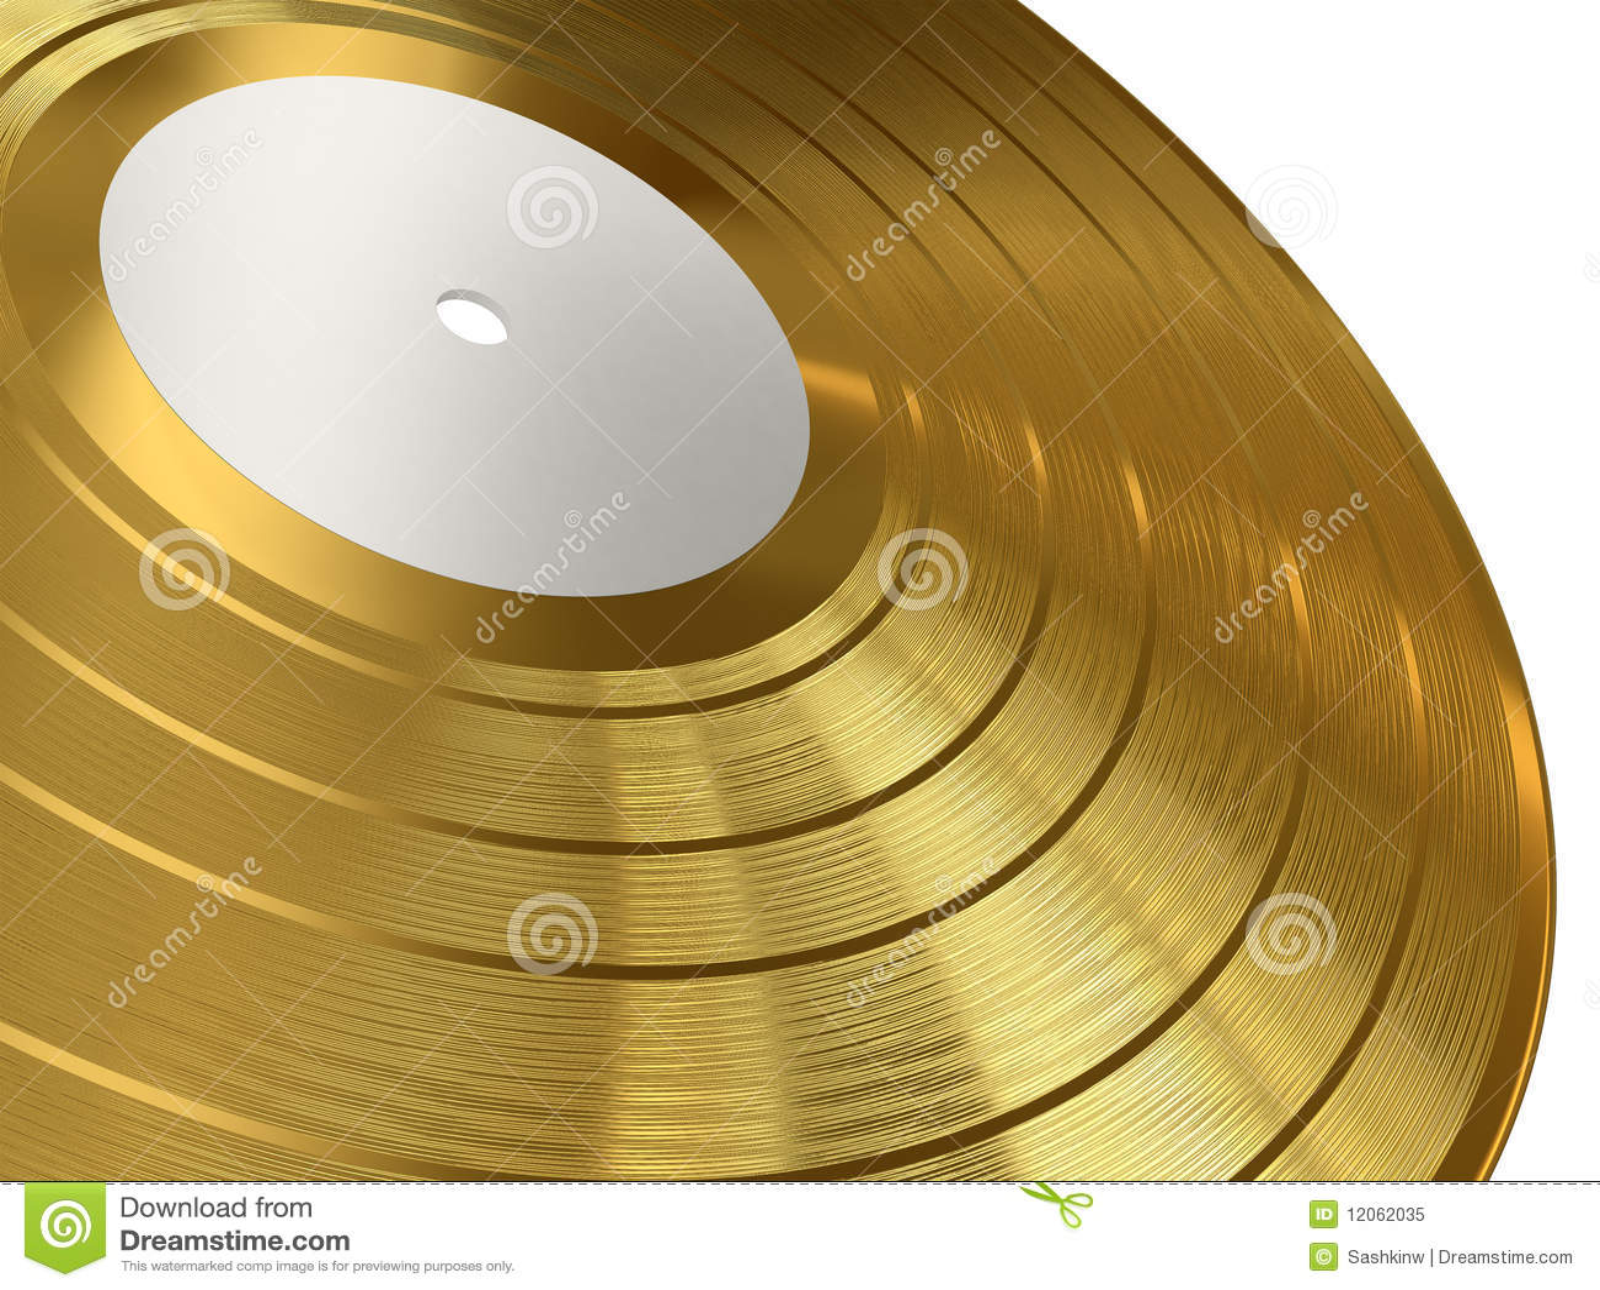 Gold Gramophone Record Royalty Free Stock Photo Image